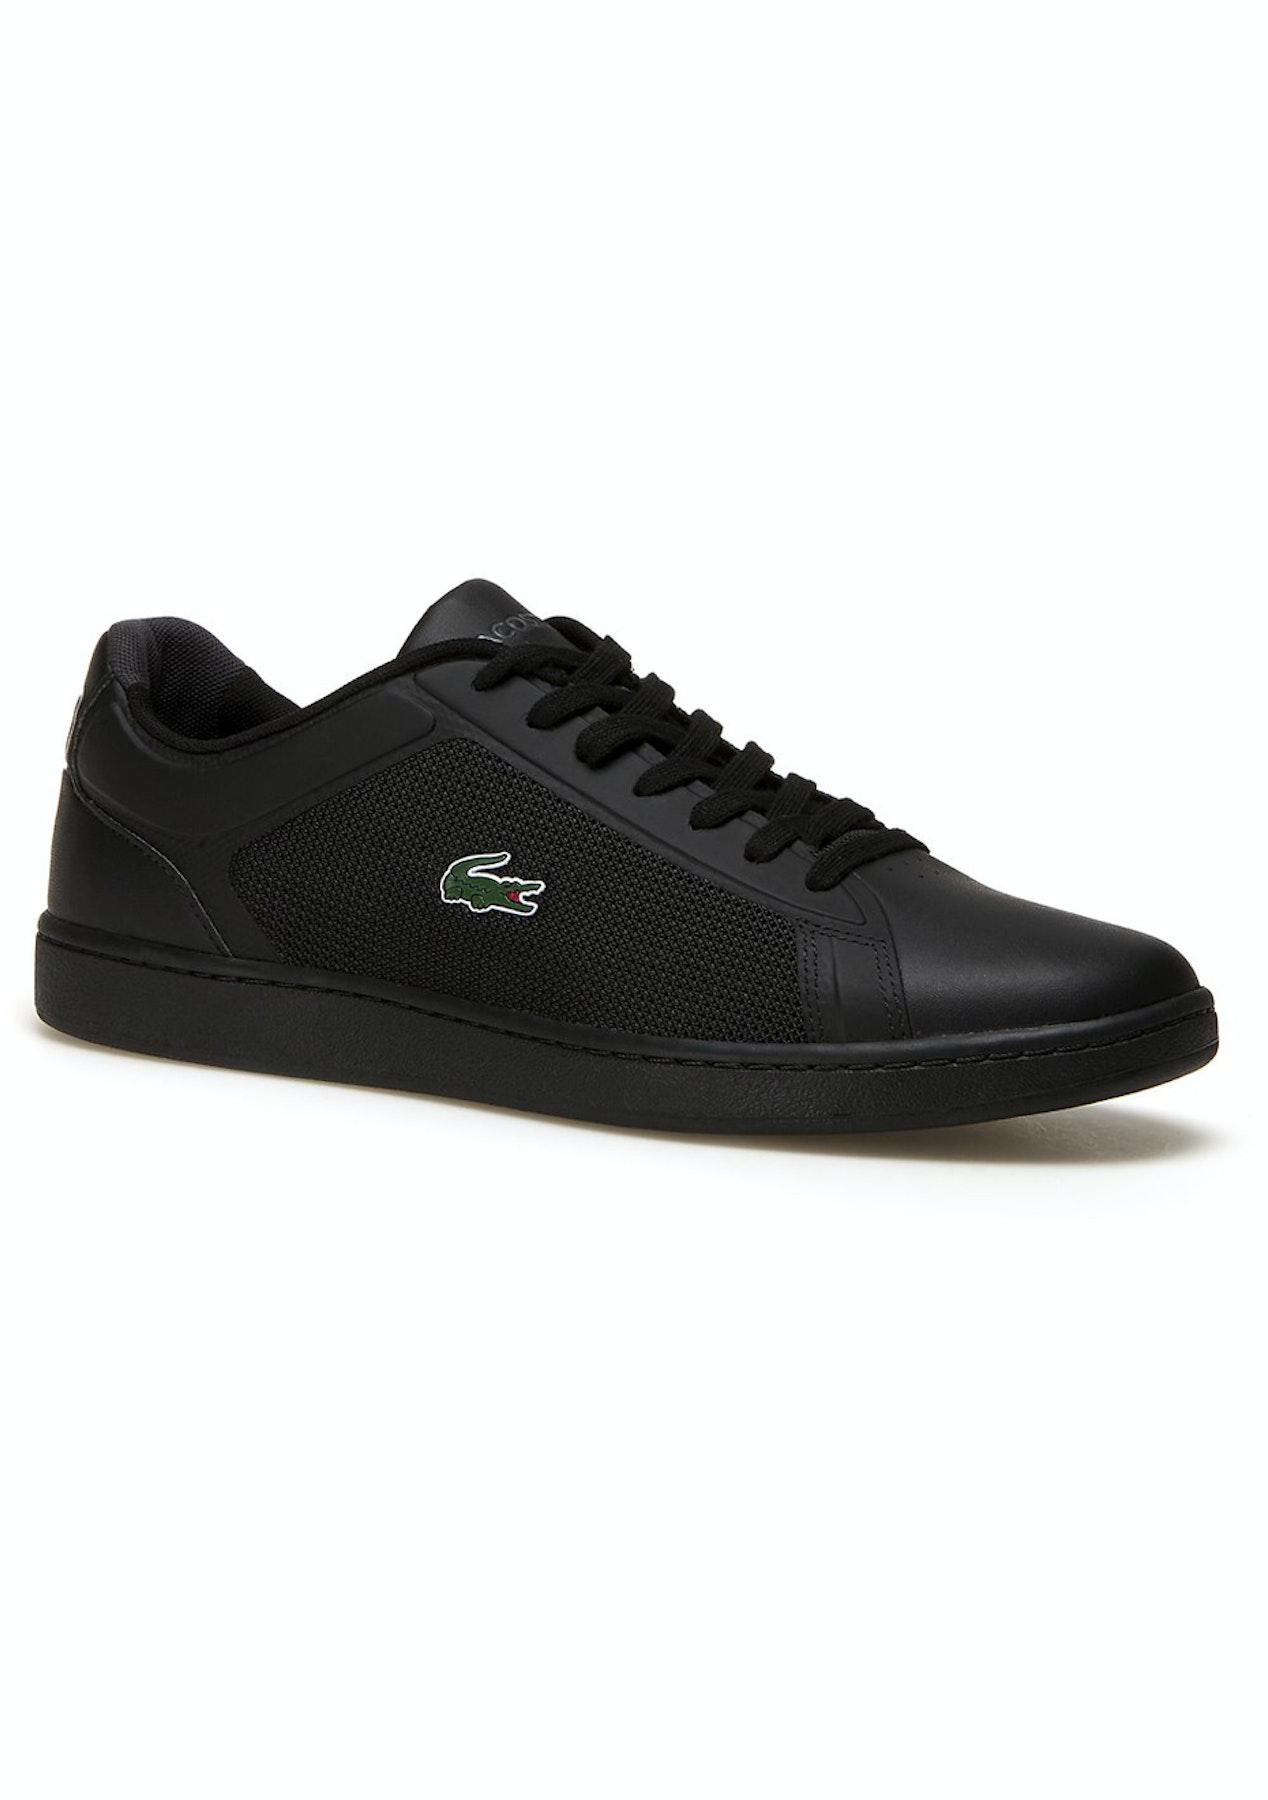 f389429b5 Mens Lacoste - Endliner 117 1 - Black - Mens Shoe Sale - Onceit